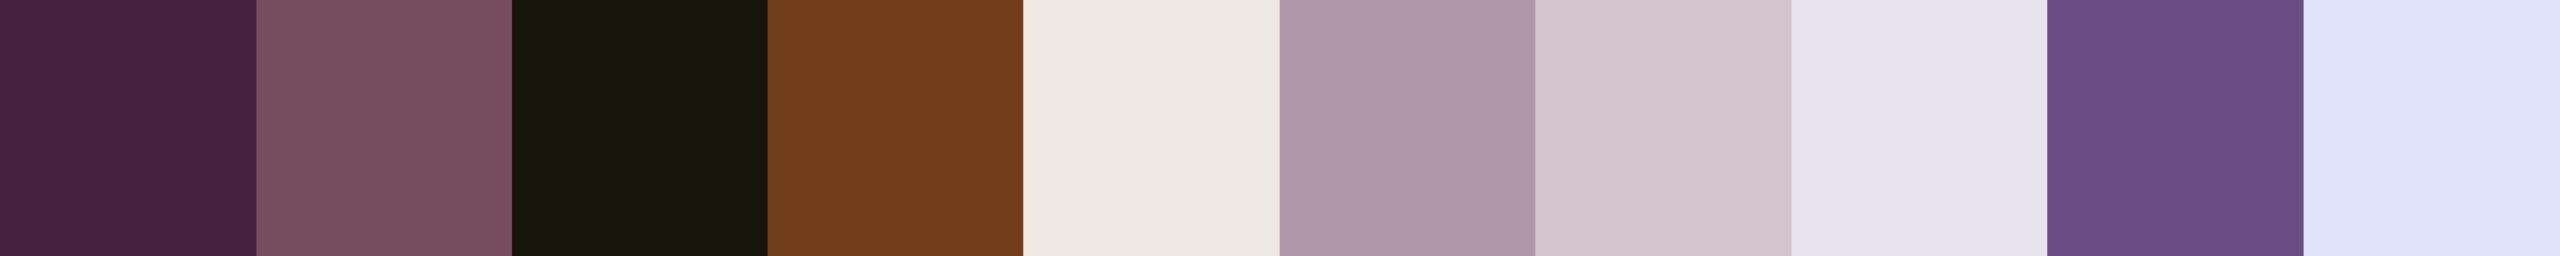 164 Dofaretia Color Palette